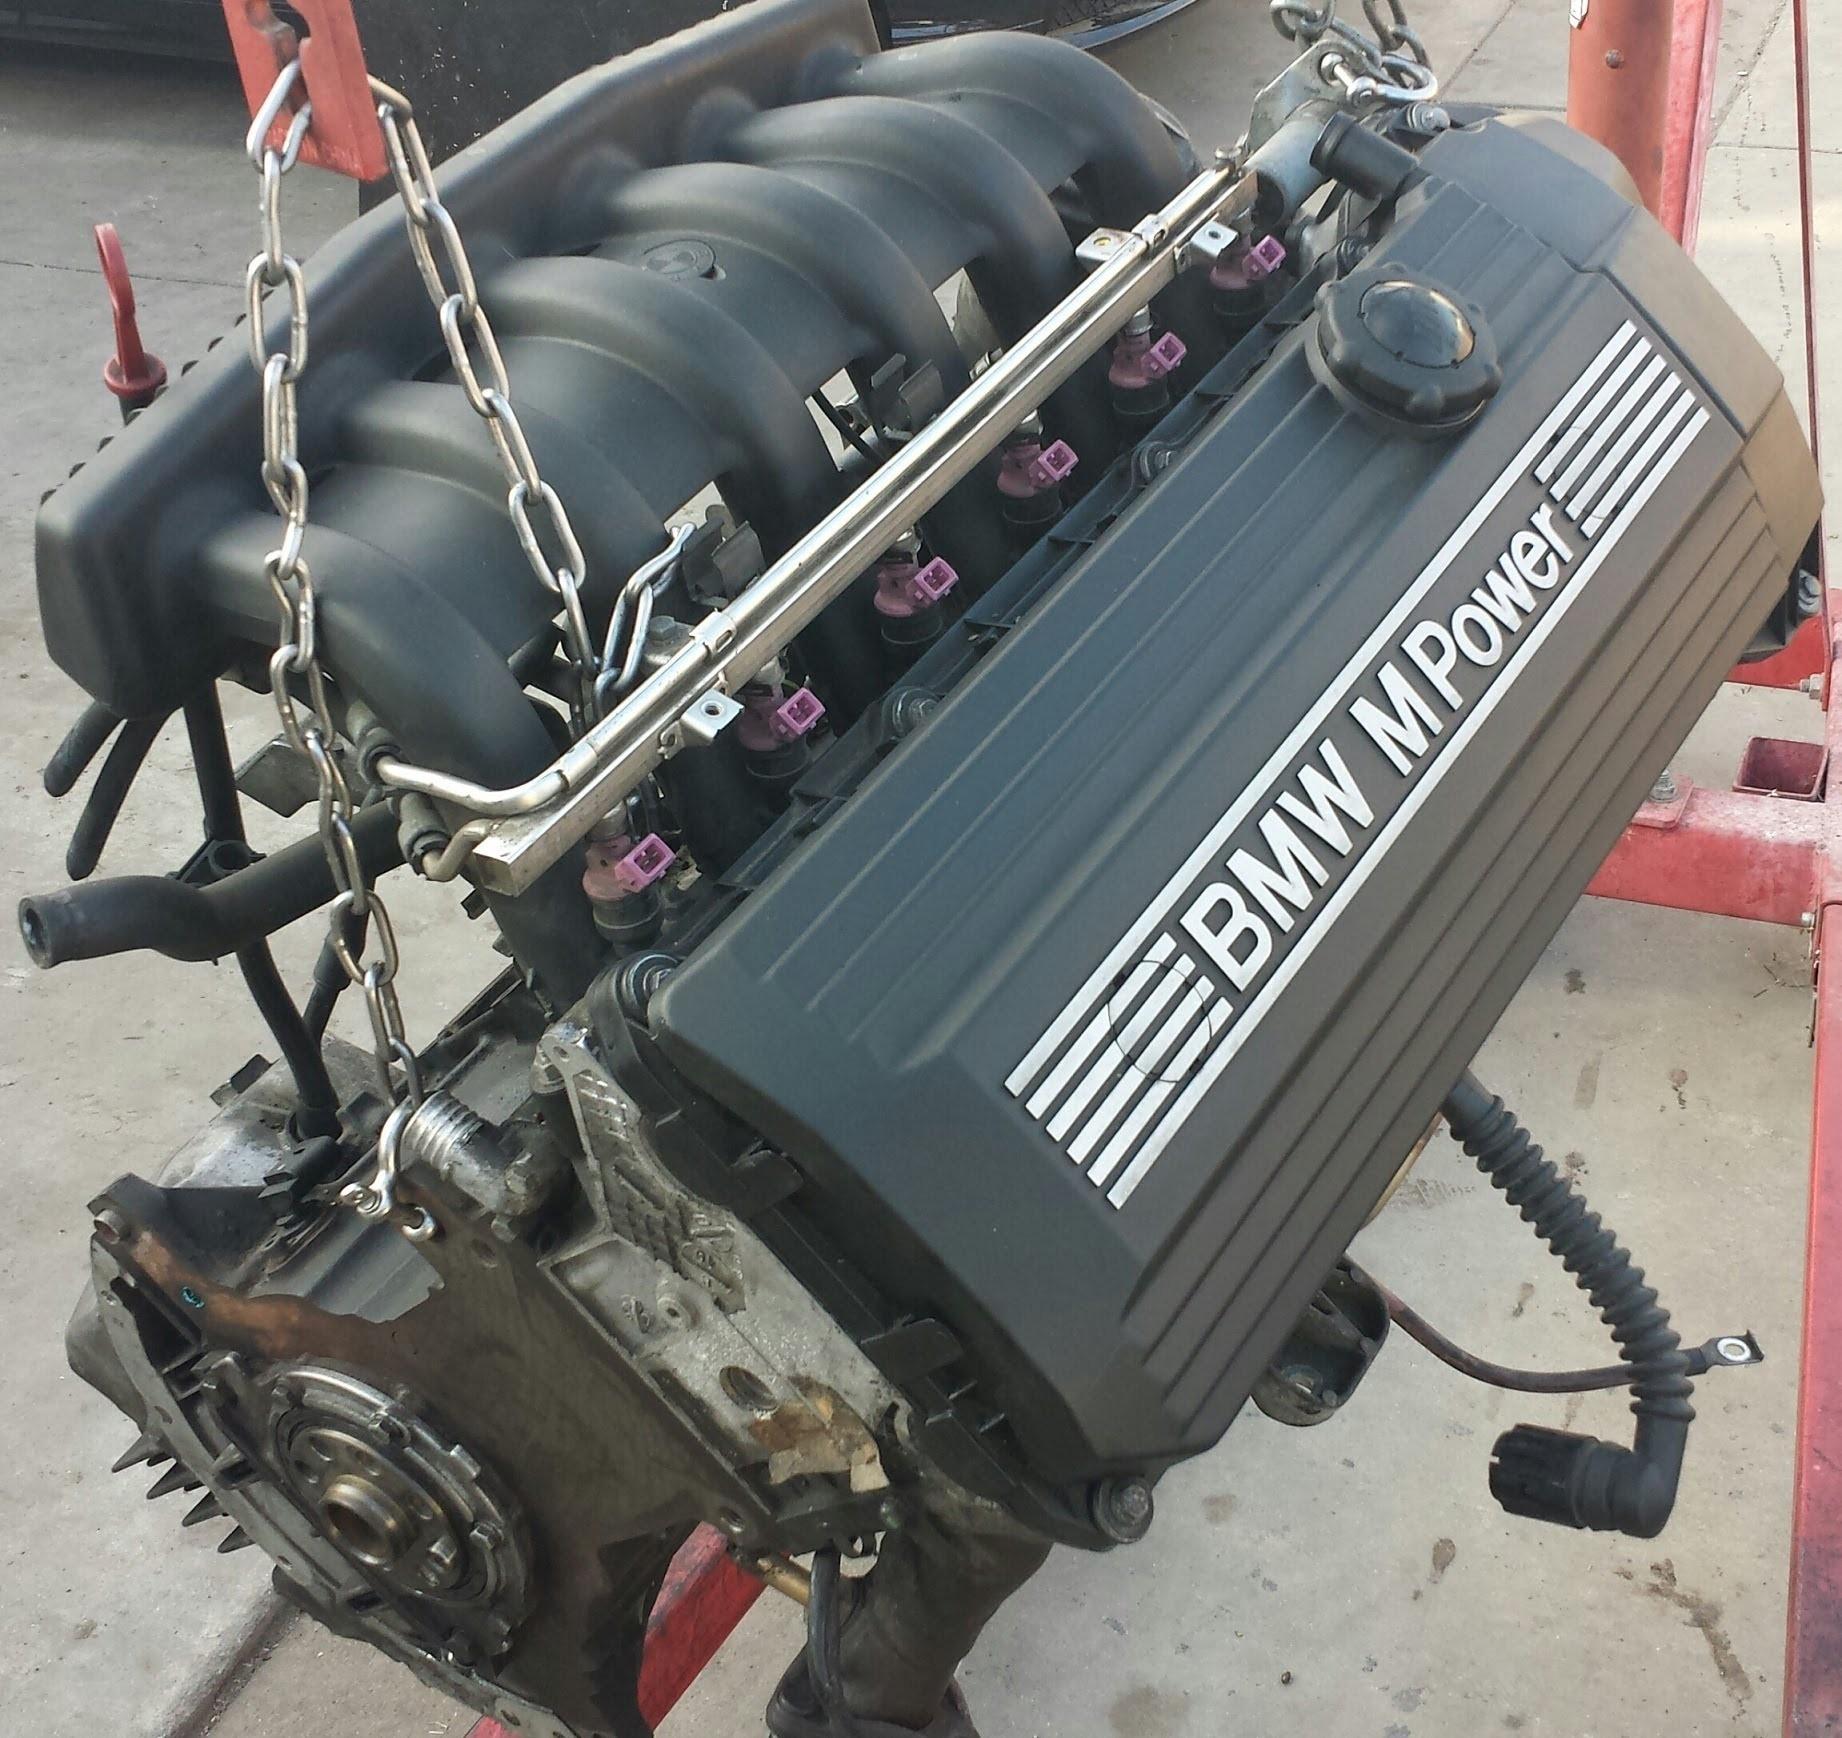 hight resolution of 1996 bmw 328i engine diagram bmw e36 m3 engine maintenance diagram 325 328 s52 motor of